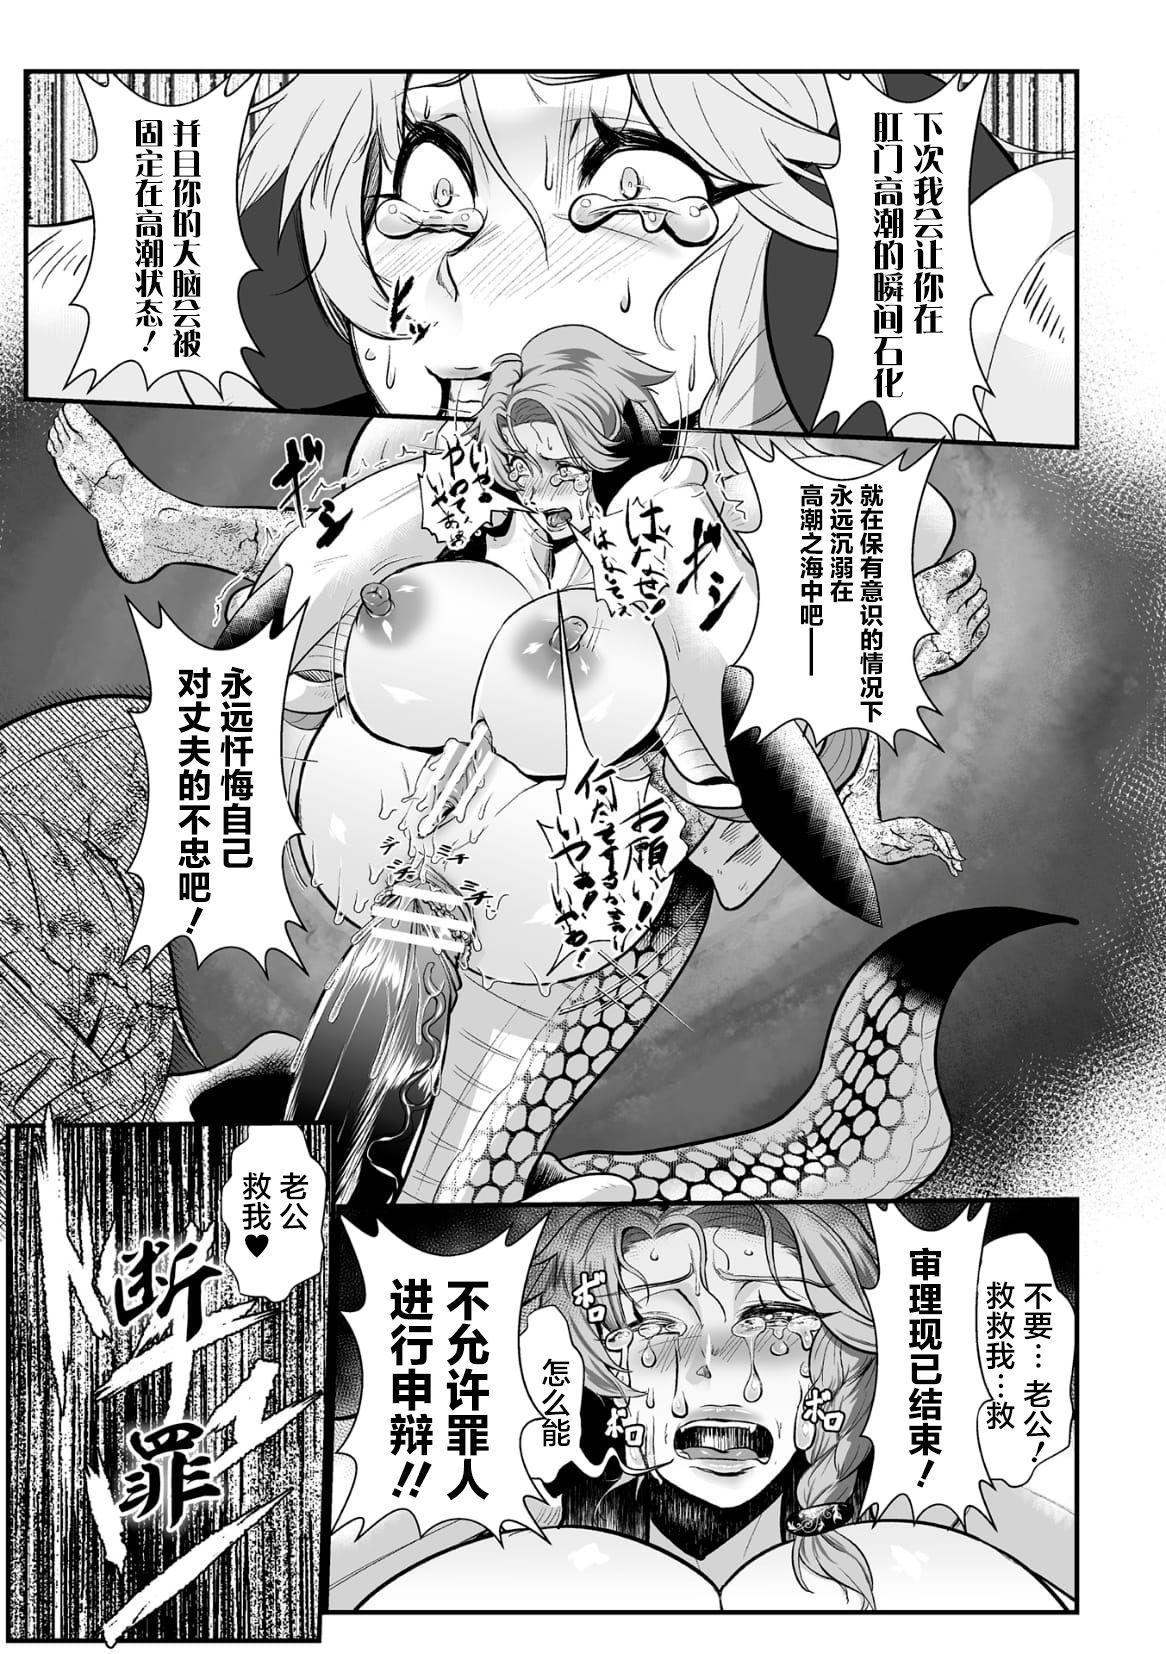 [Mou] Sekkan Fuuin ~Enbi na Sekizou ni Otosareshi Yuusha Ichizoku~ Ch. 1 [Chinese] [不咕鸟汉化组] 26